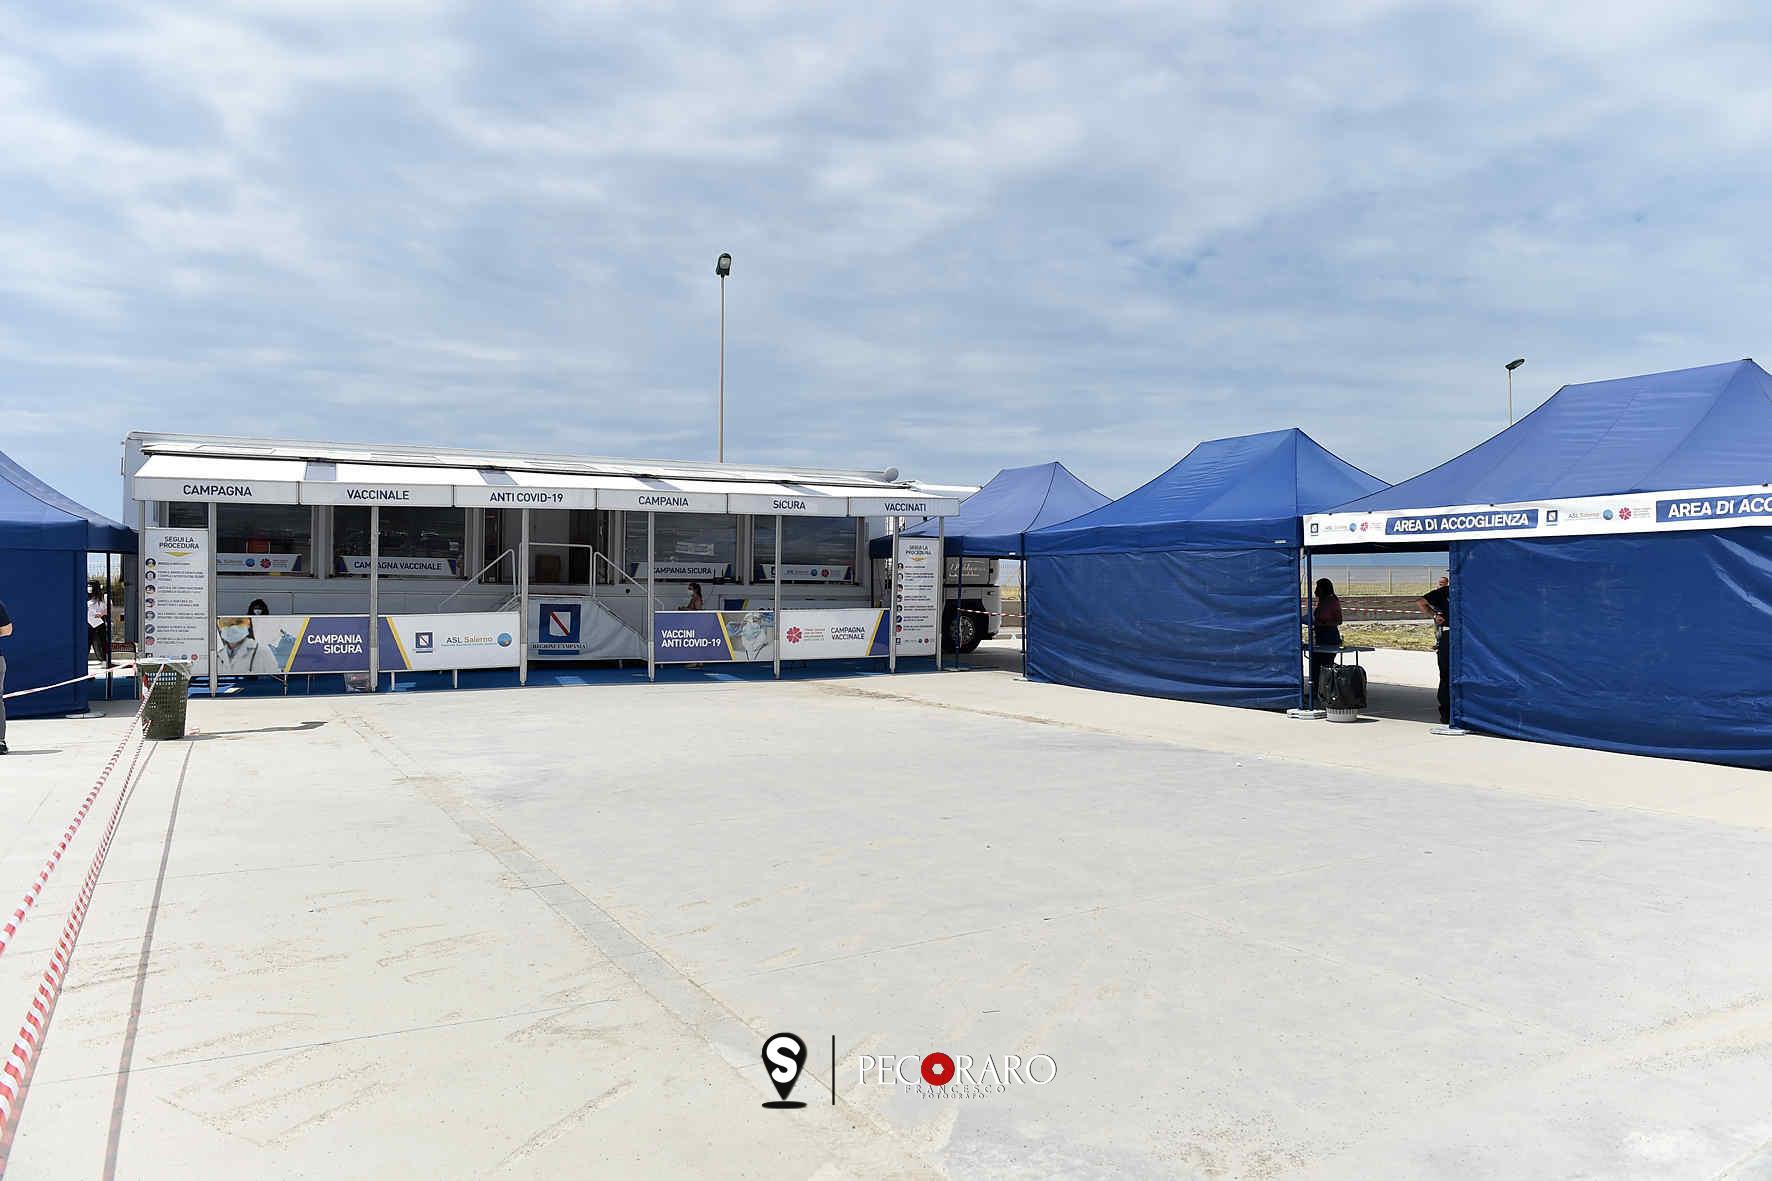 SAL - 05 06 2021 Salerno Area PIP Nautico San Matteo. Open Day. Foto Tanopress